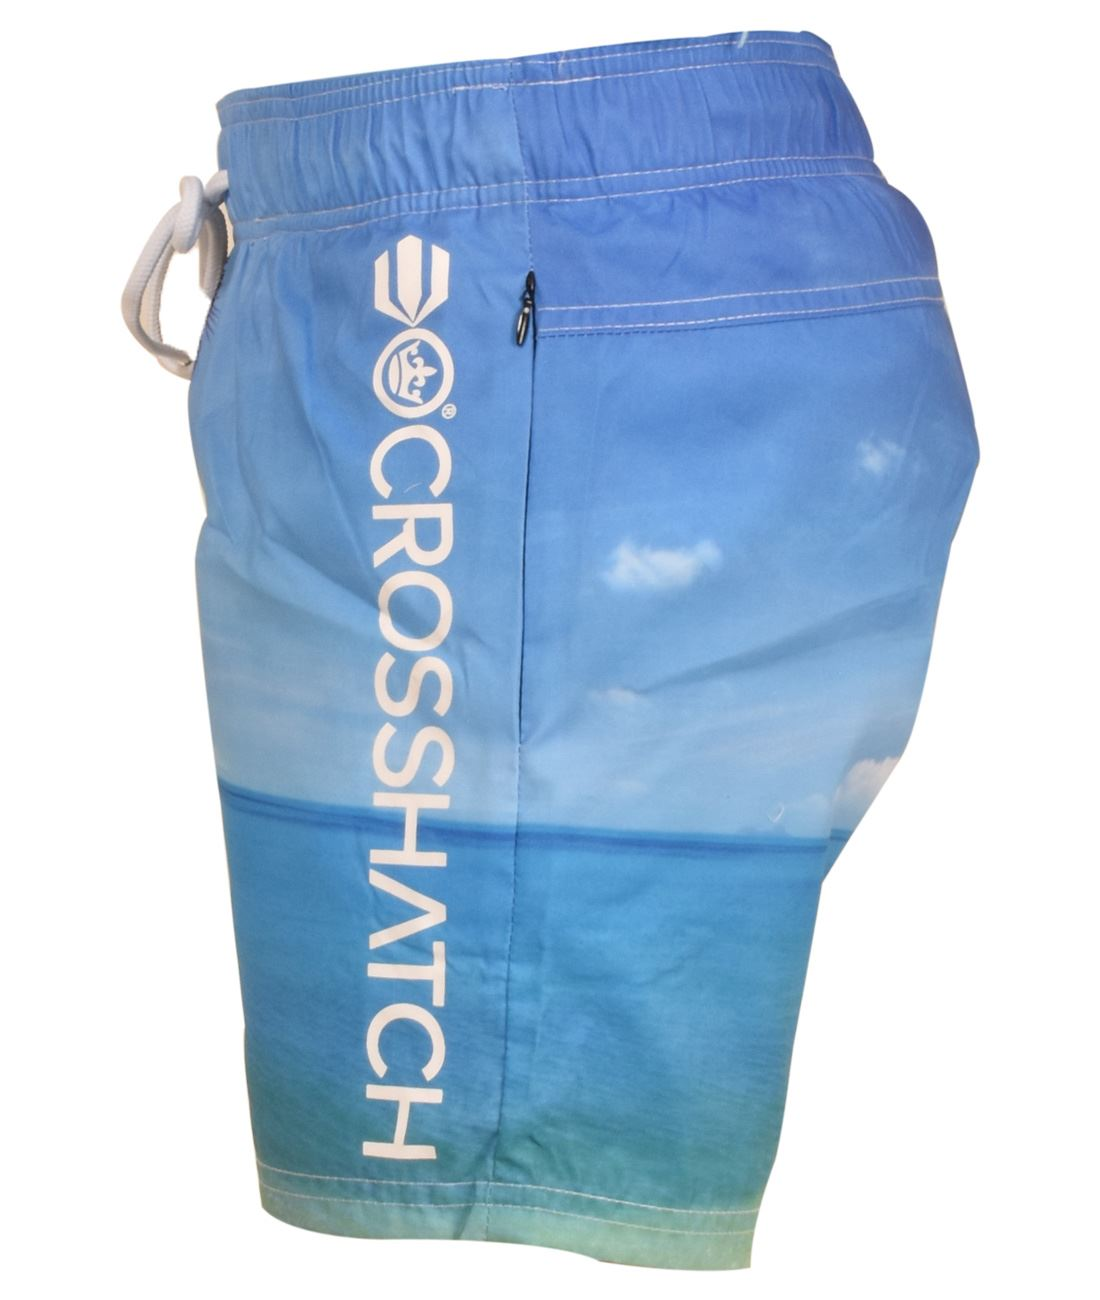 Crosshatch-Hawaiin-Sun-Set-Mens-Holiday-Swim-Shorts-Summer-Beach-Trunks-S-2XL thumbnail 4